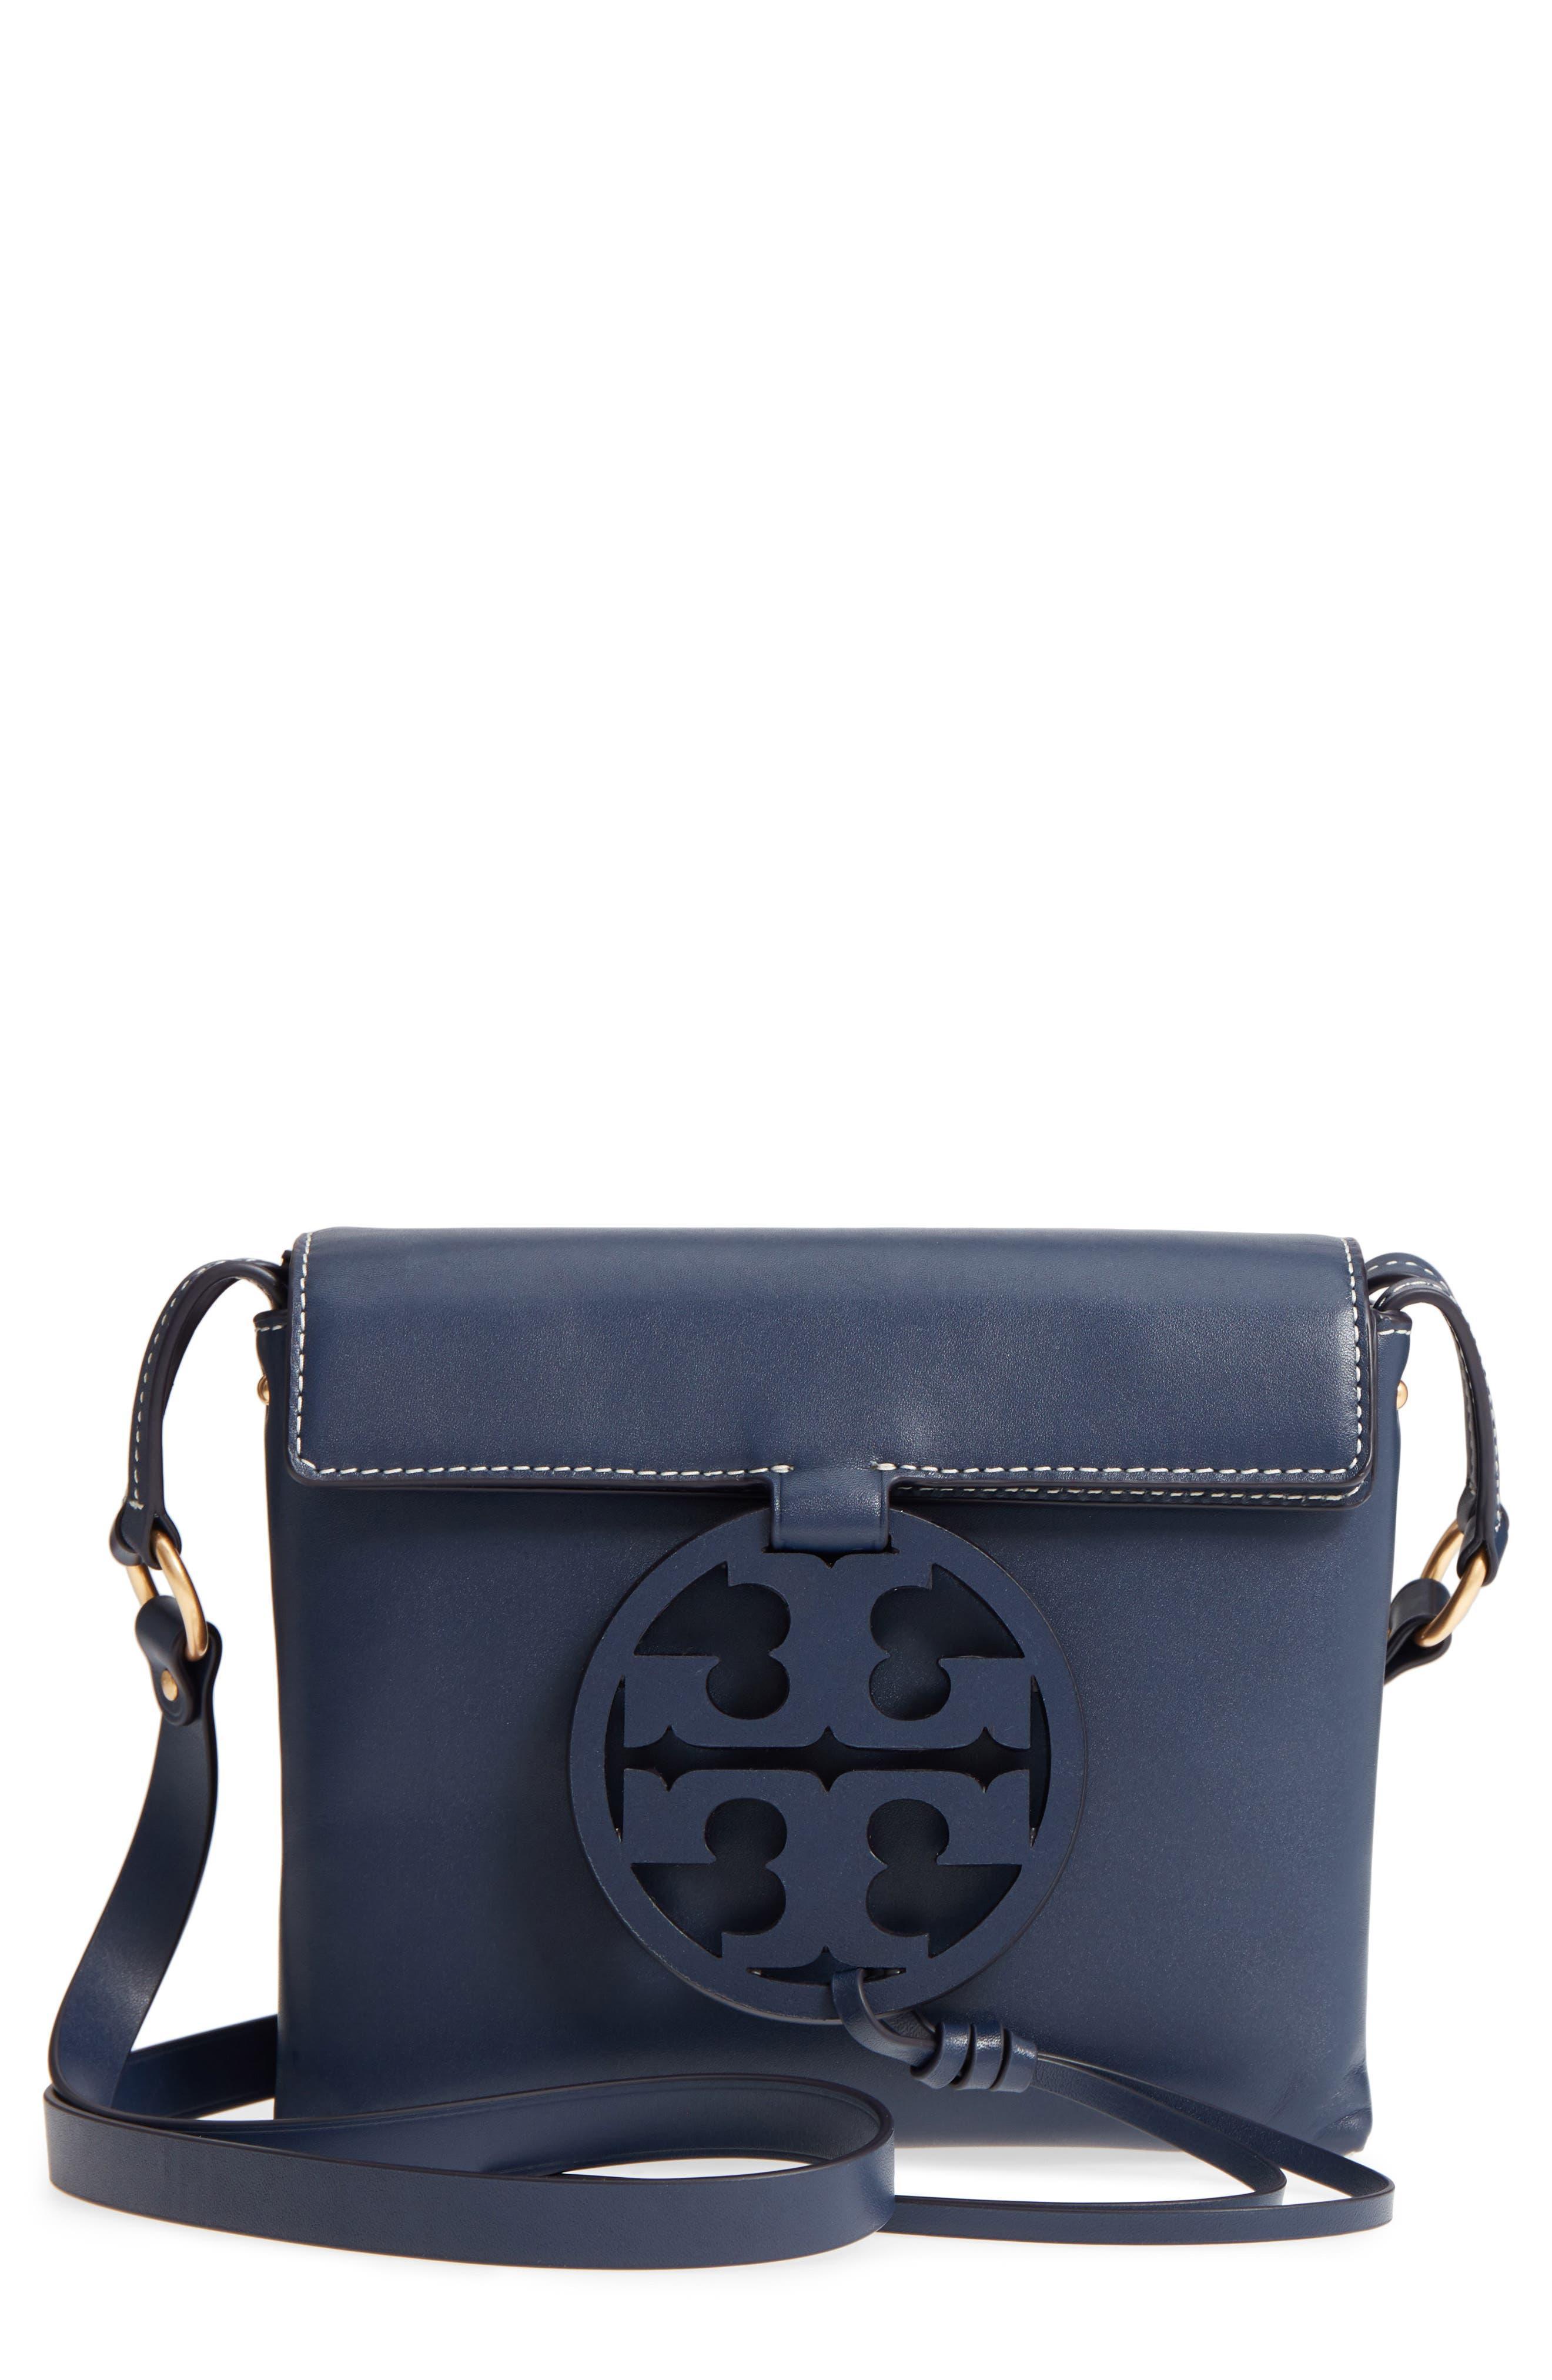 Miller Leather Crossbody Bag,                             Main thumbnail 1, color,                             Royal Navy